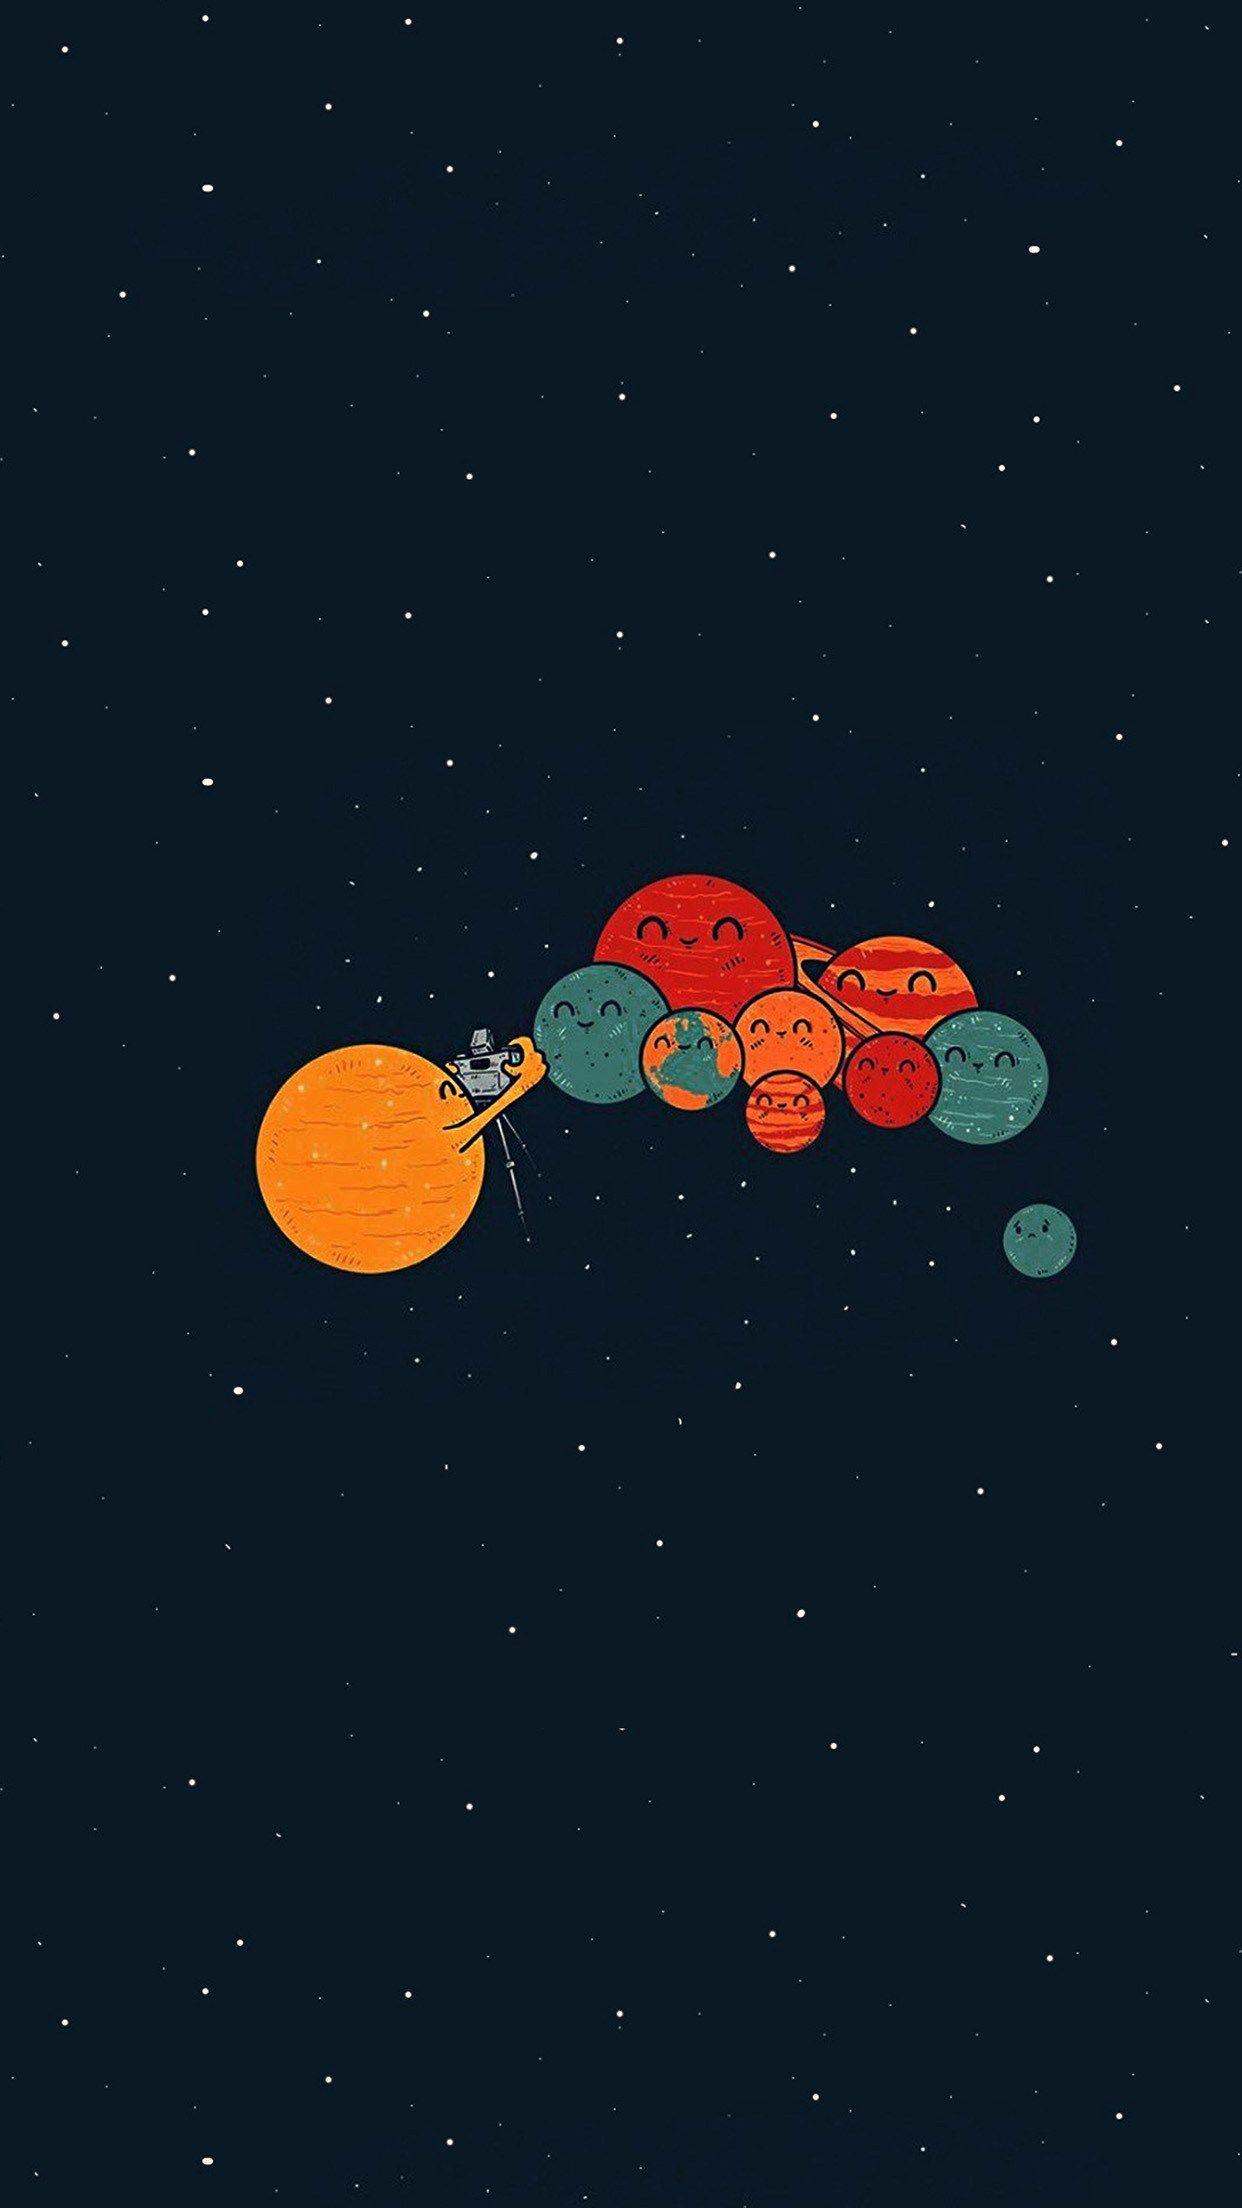 Space Aesthetic Desktop Wallpaper Hd